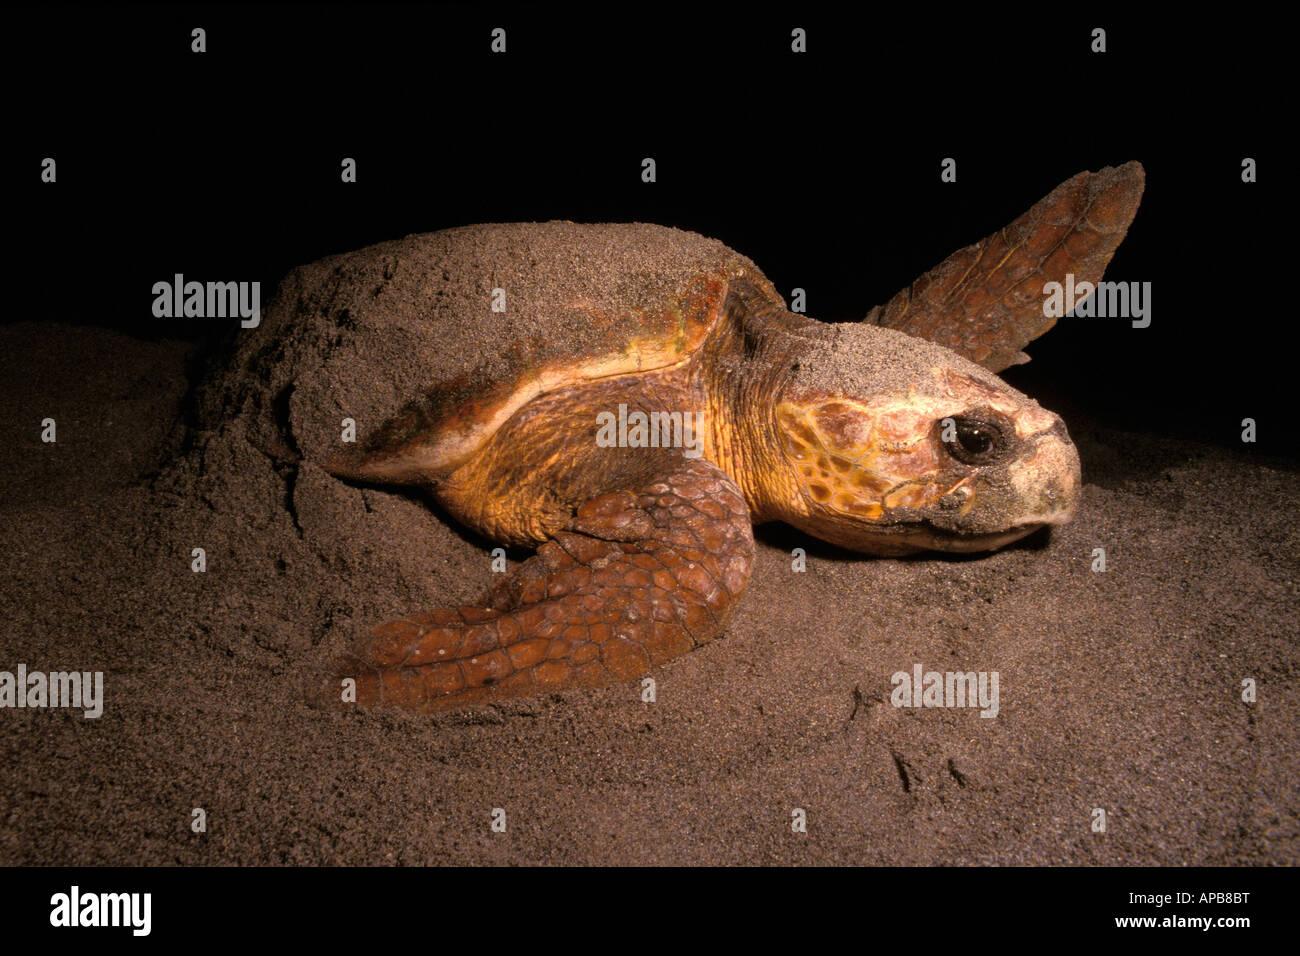 Loggerhead turtle Caretta caretta nesting - Stock Image